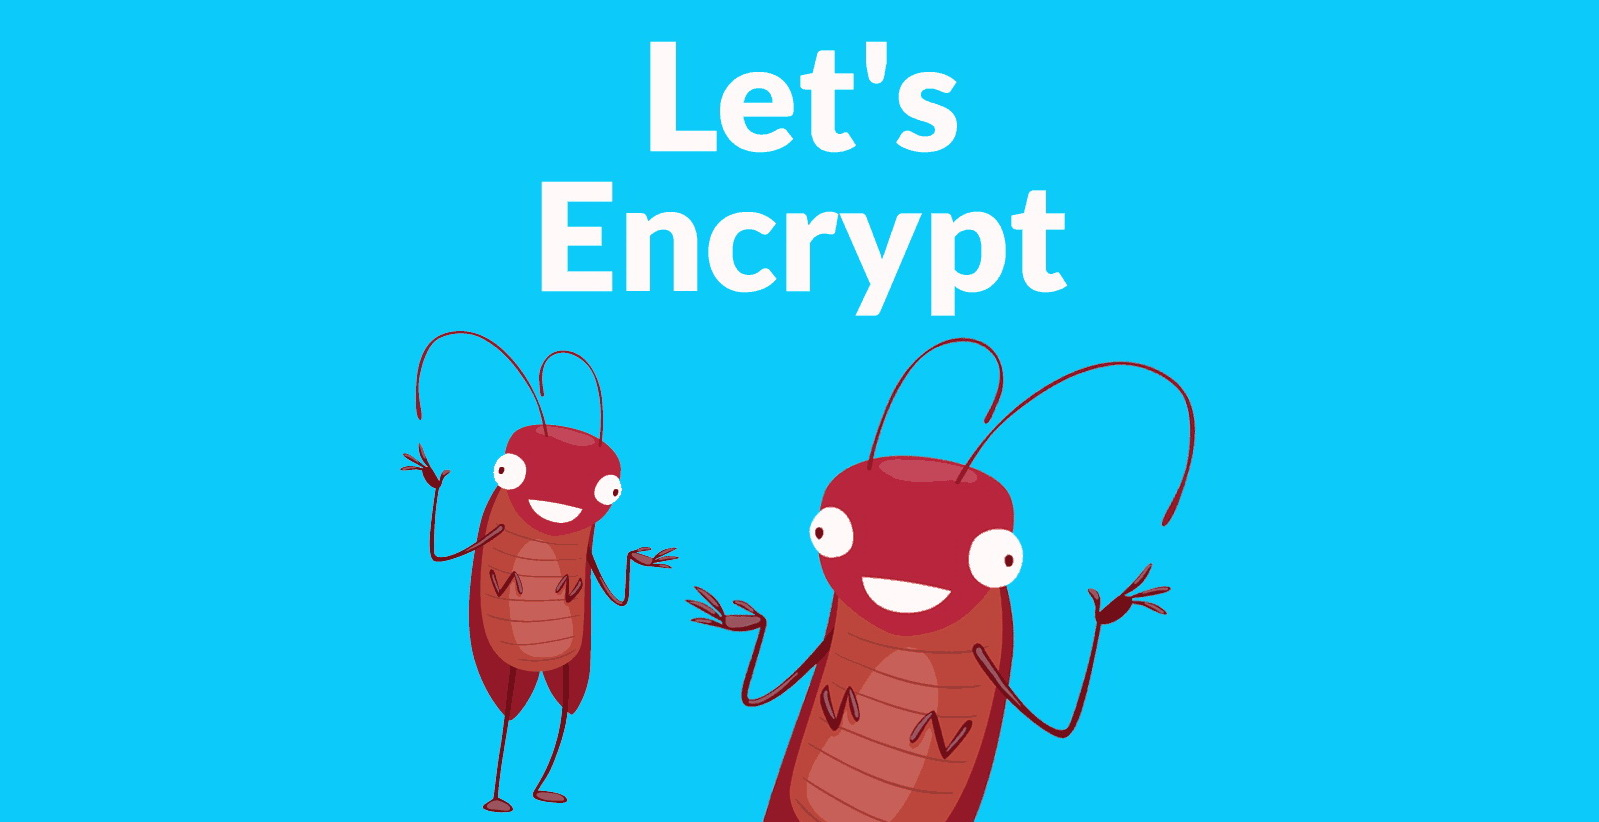 Let's Encrypt revokes certificates